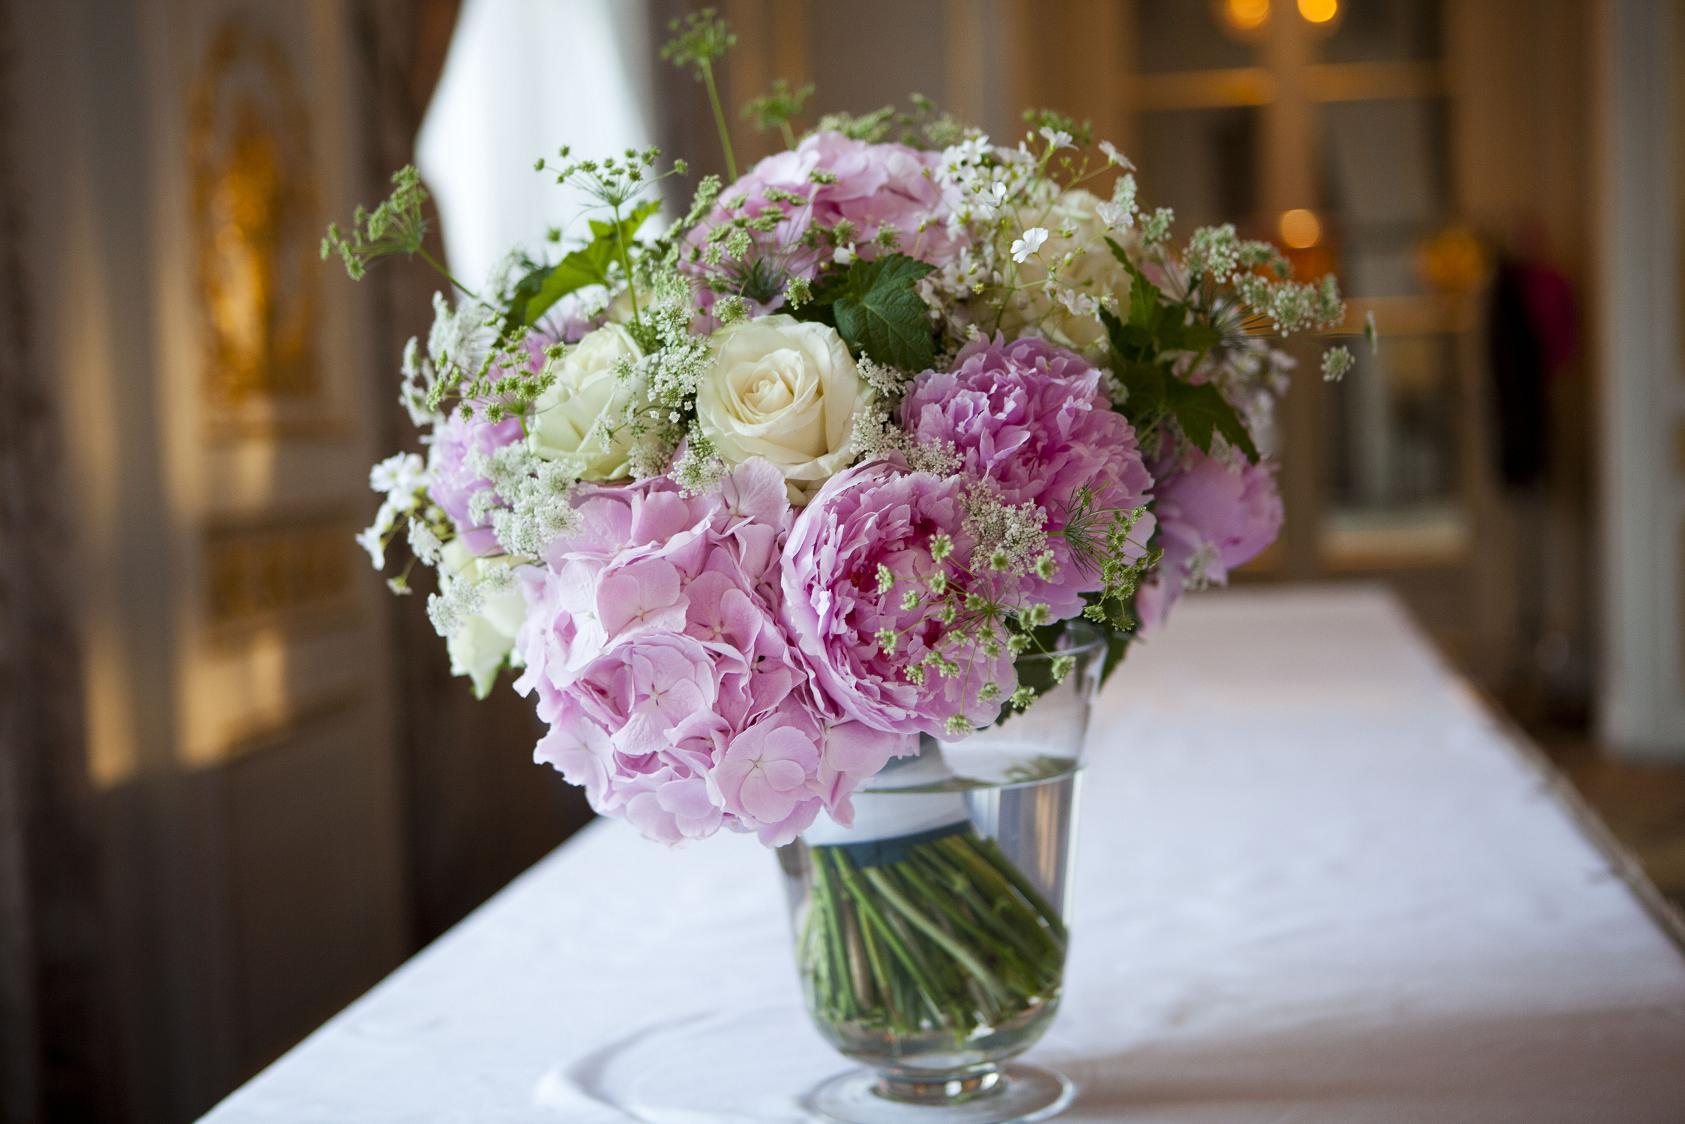 Pin Decoration Florale Mariage Exotique Deco Salle on Pinterest